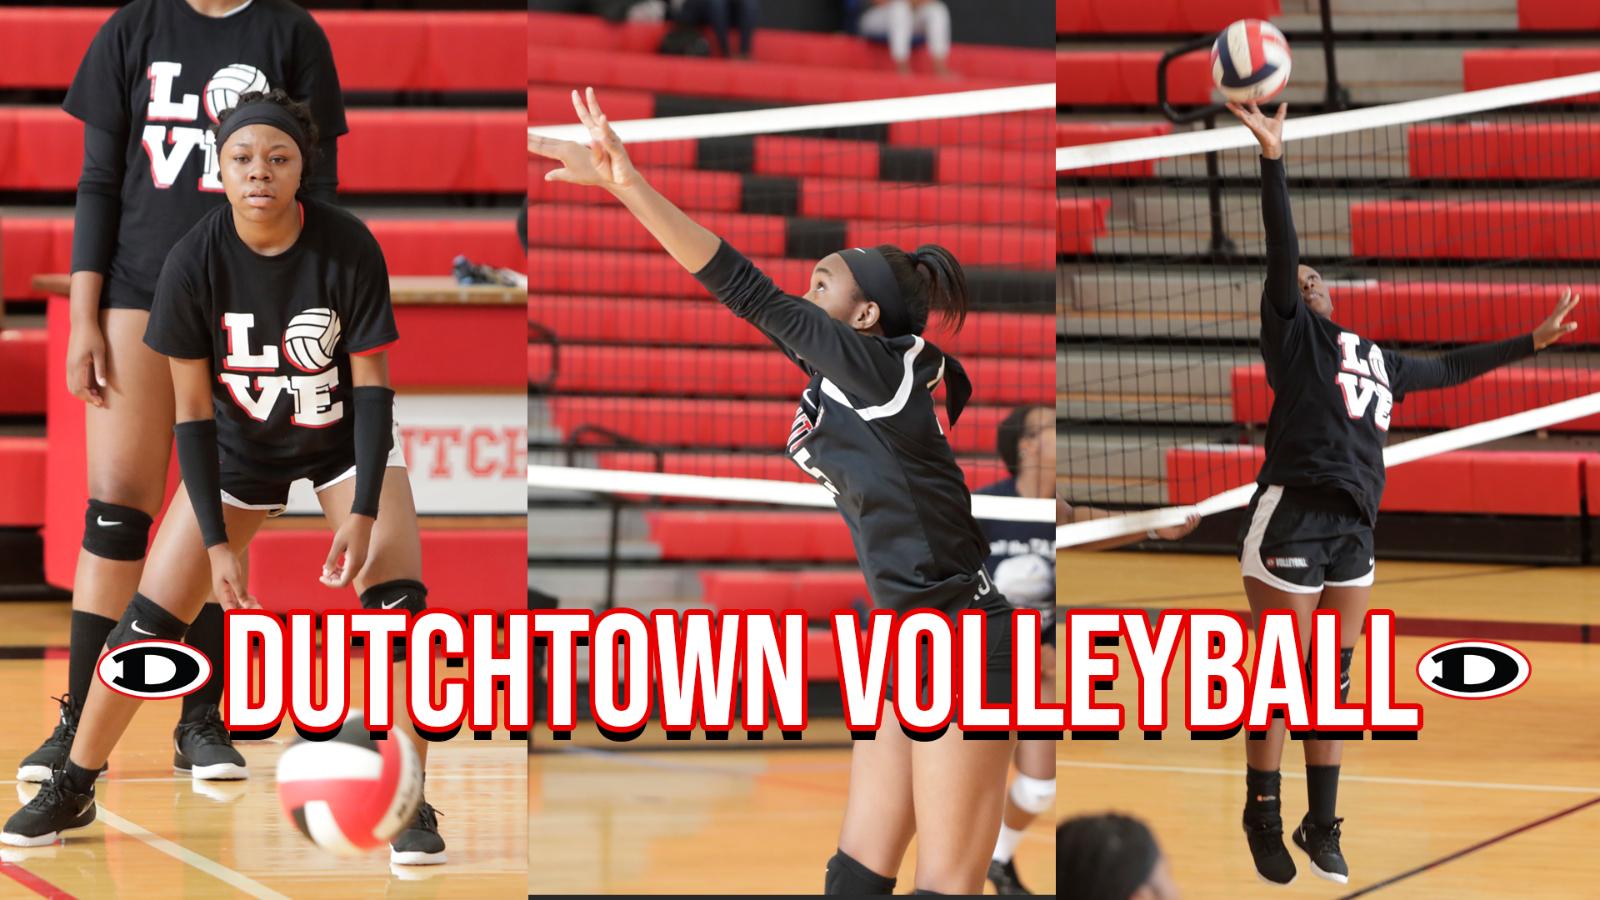 Dutchtown Volleyball vs. Hampton High (10/1)